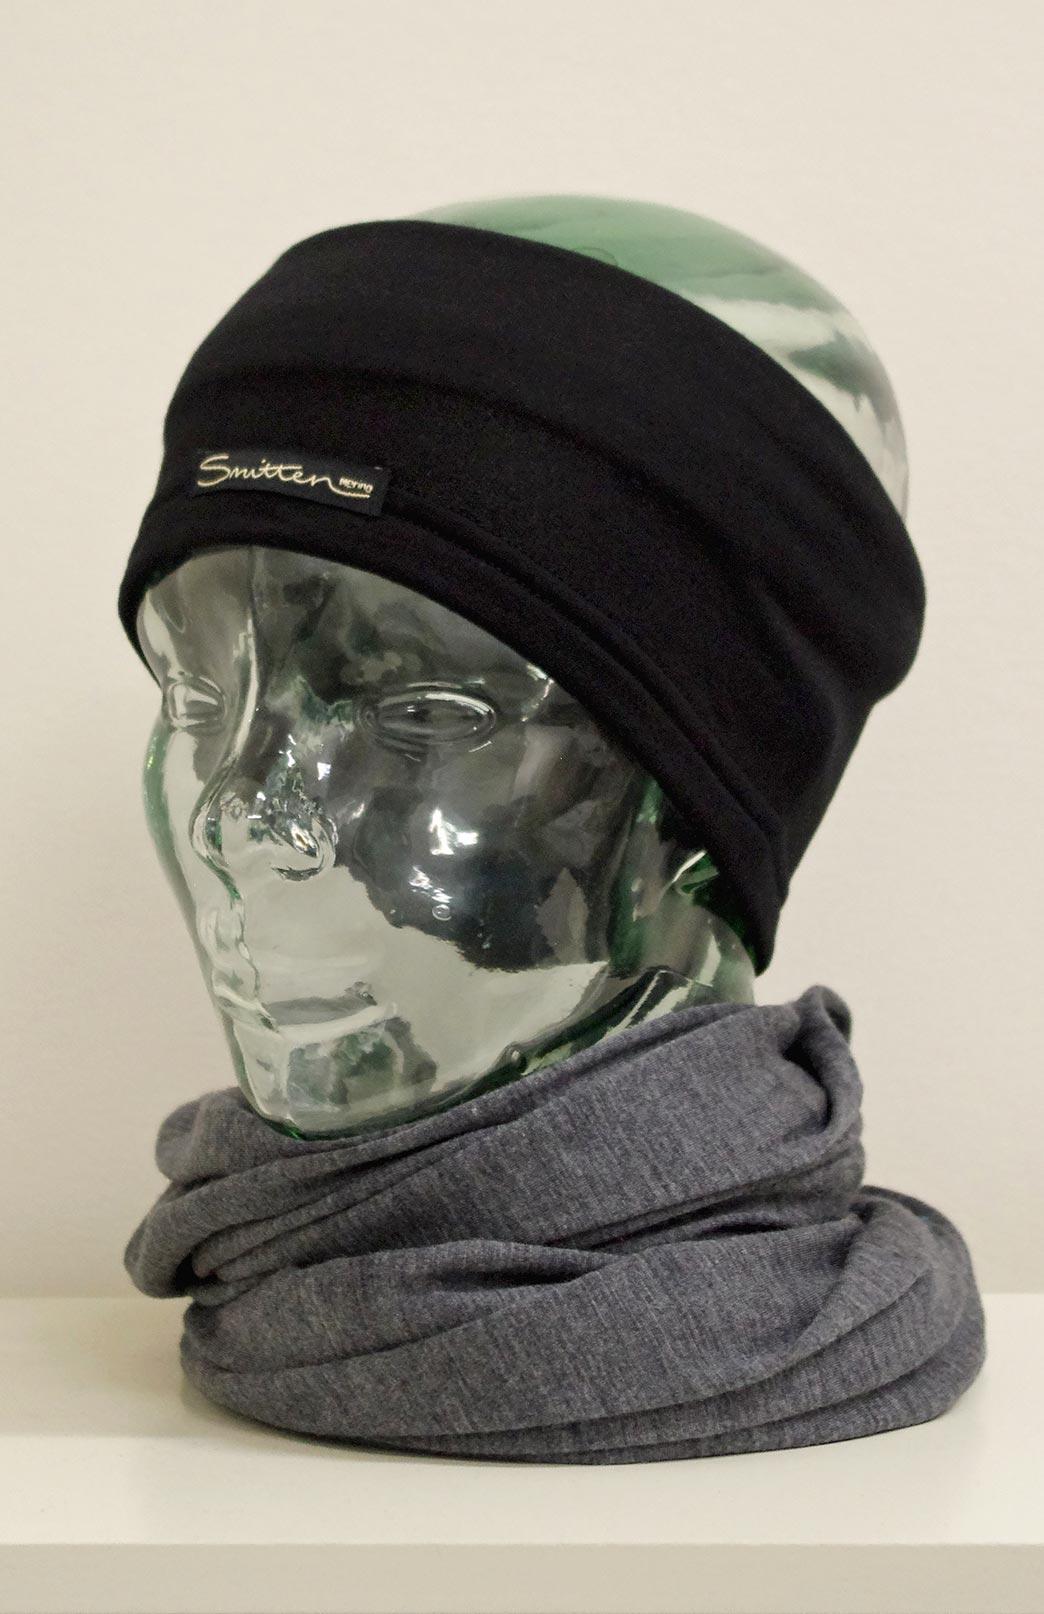 Headband / Ear Warmer - Unisex Black Fleece Merino Wool Headband and Ear Warmer - Smitten Merino Tasmania Australia